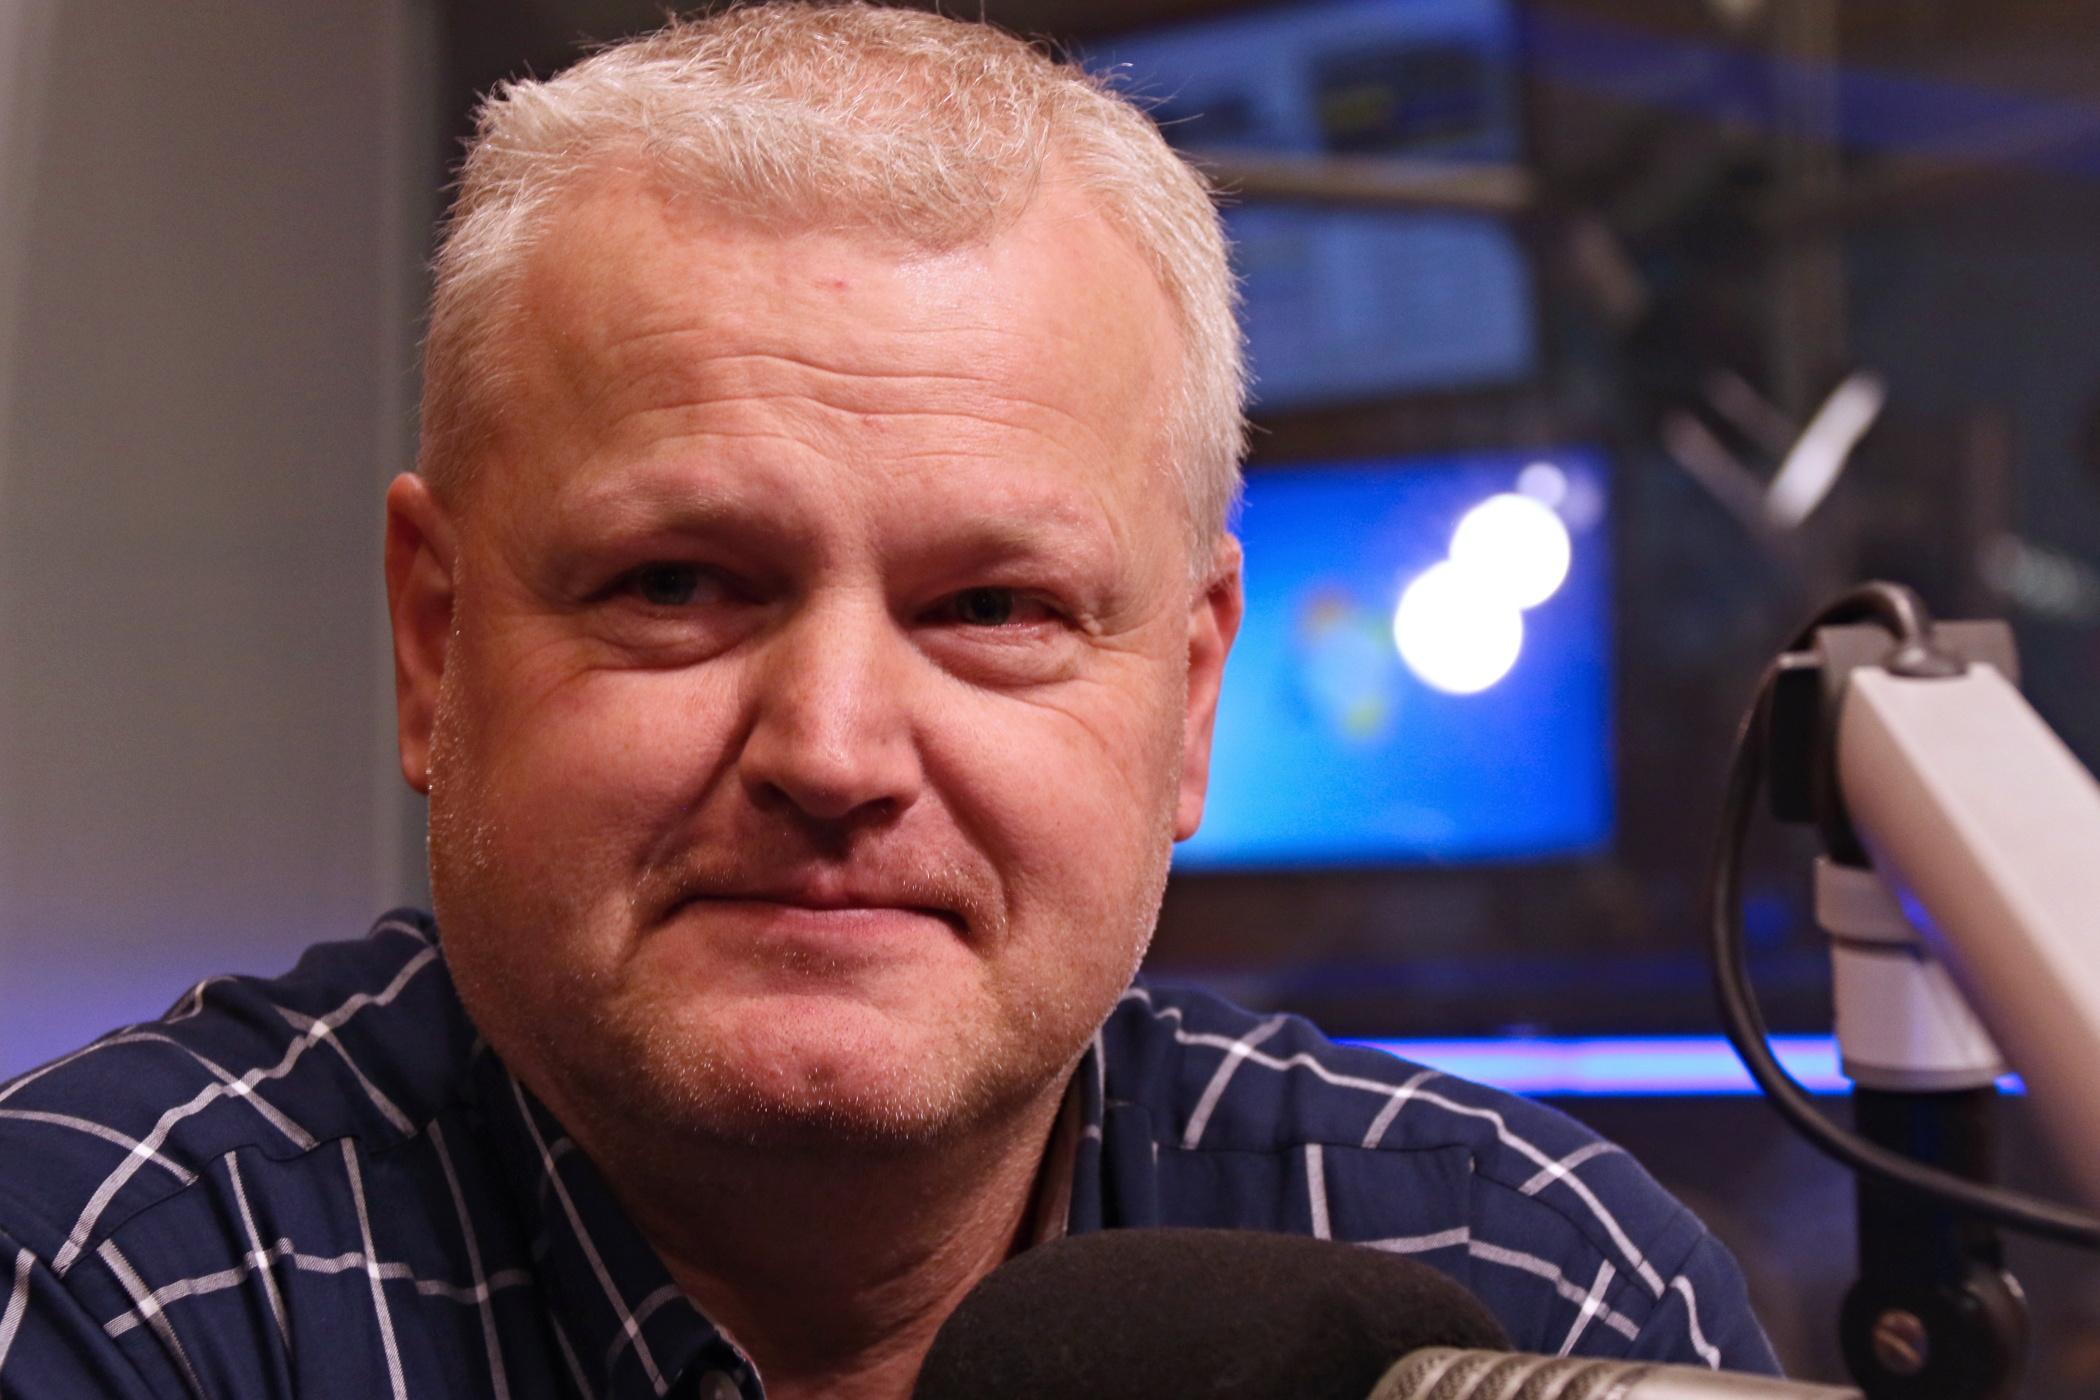 Michal Pavlas